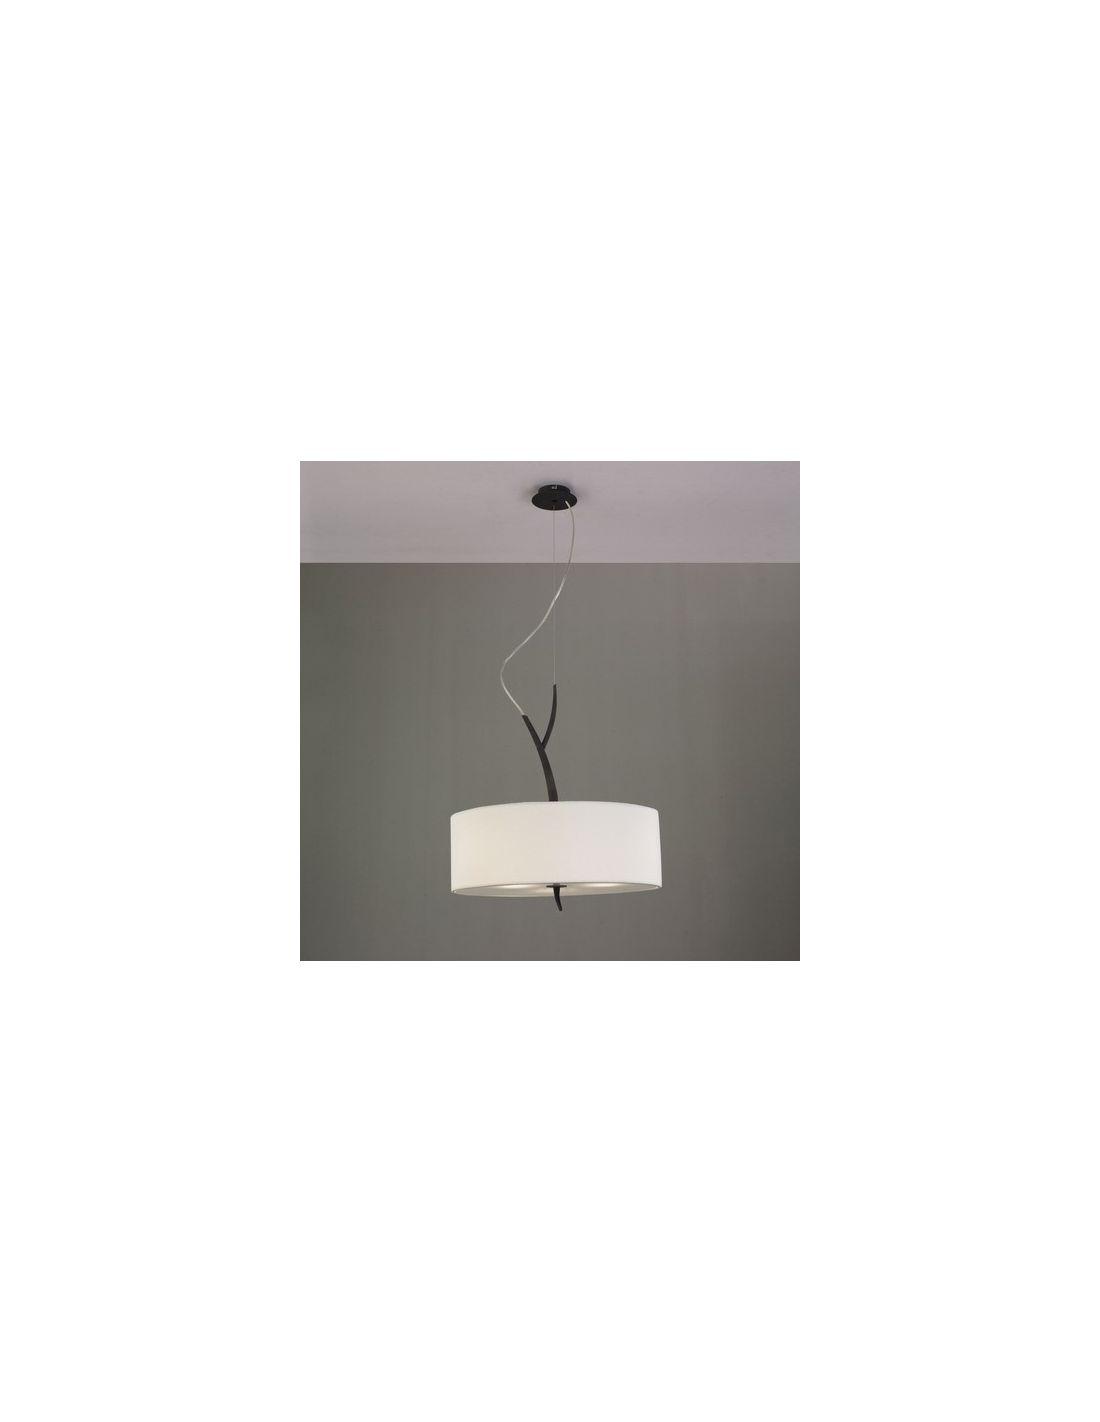 Lamparas con pantallas lamparas pantallas blanco roto lampara pantalla beige - Pantallas de lamparas ...